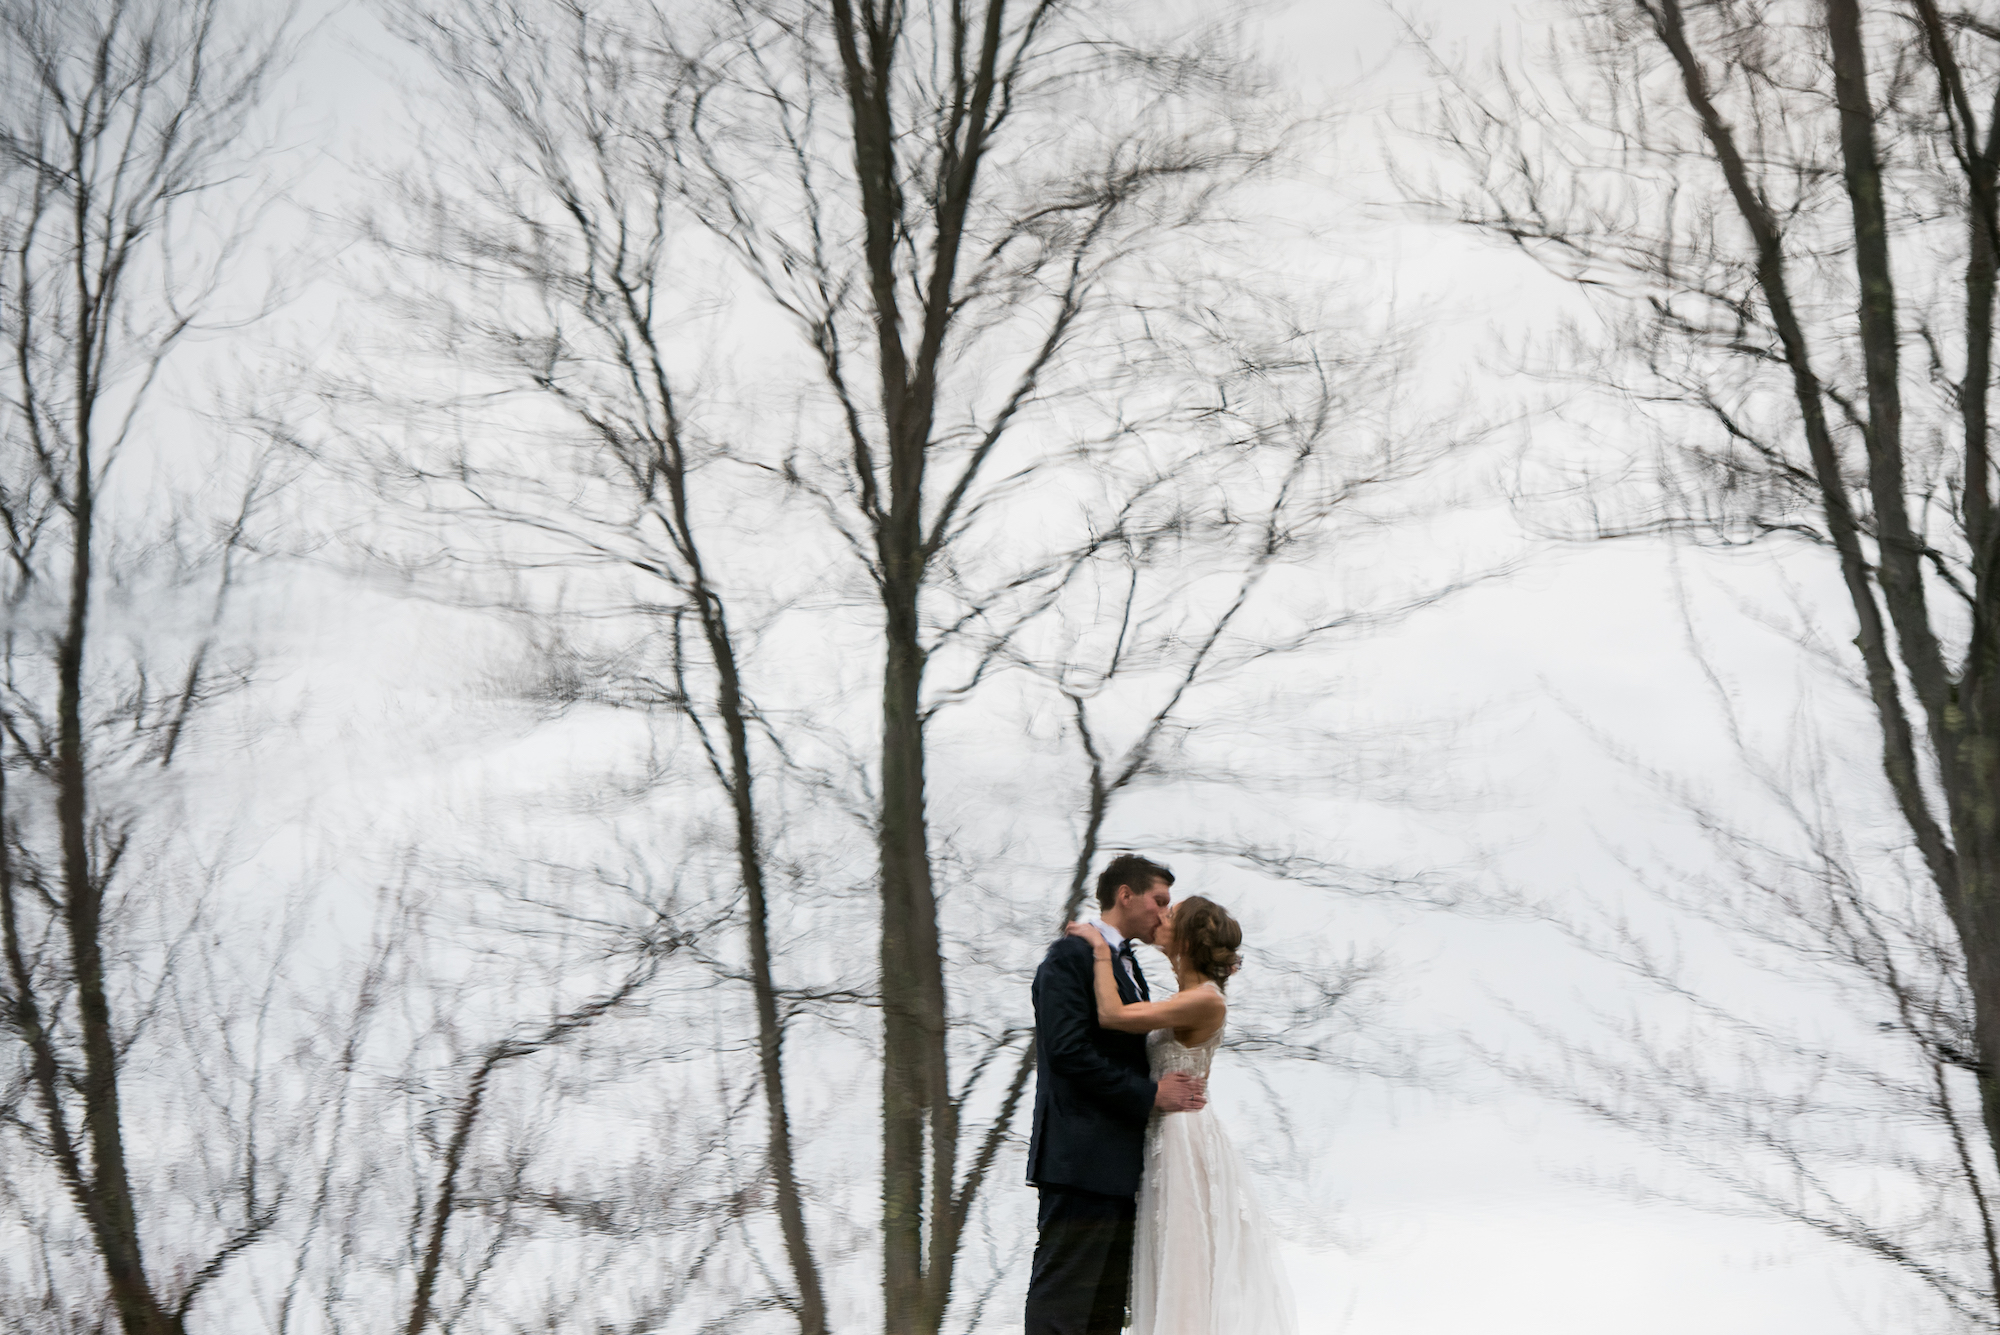 vermont-wedding-photographers-vermont-photographer-sarah-annay-photography-sleepyhollowwedding-huntington.jpg